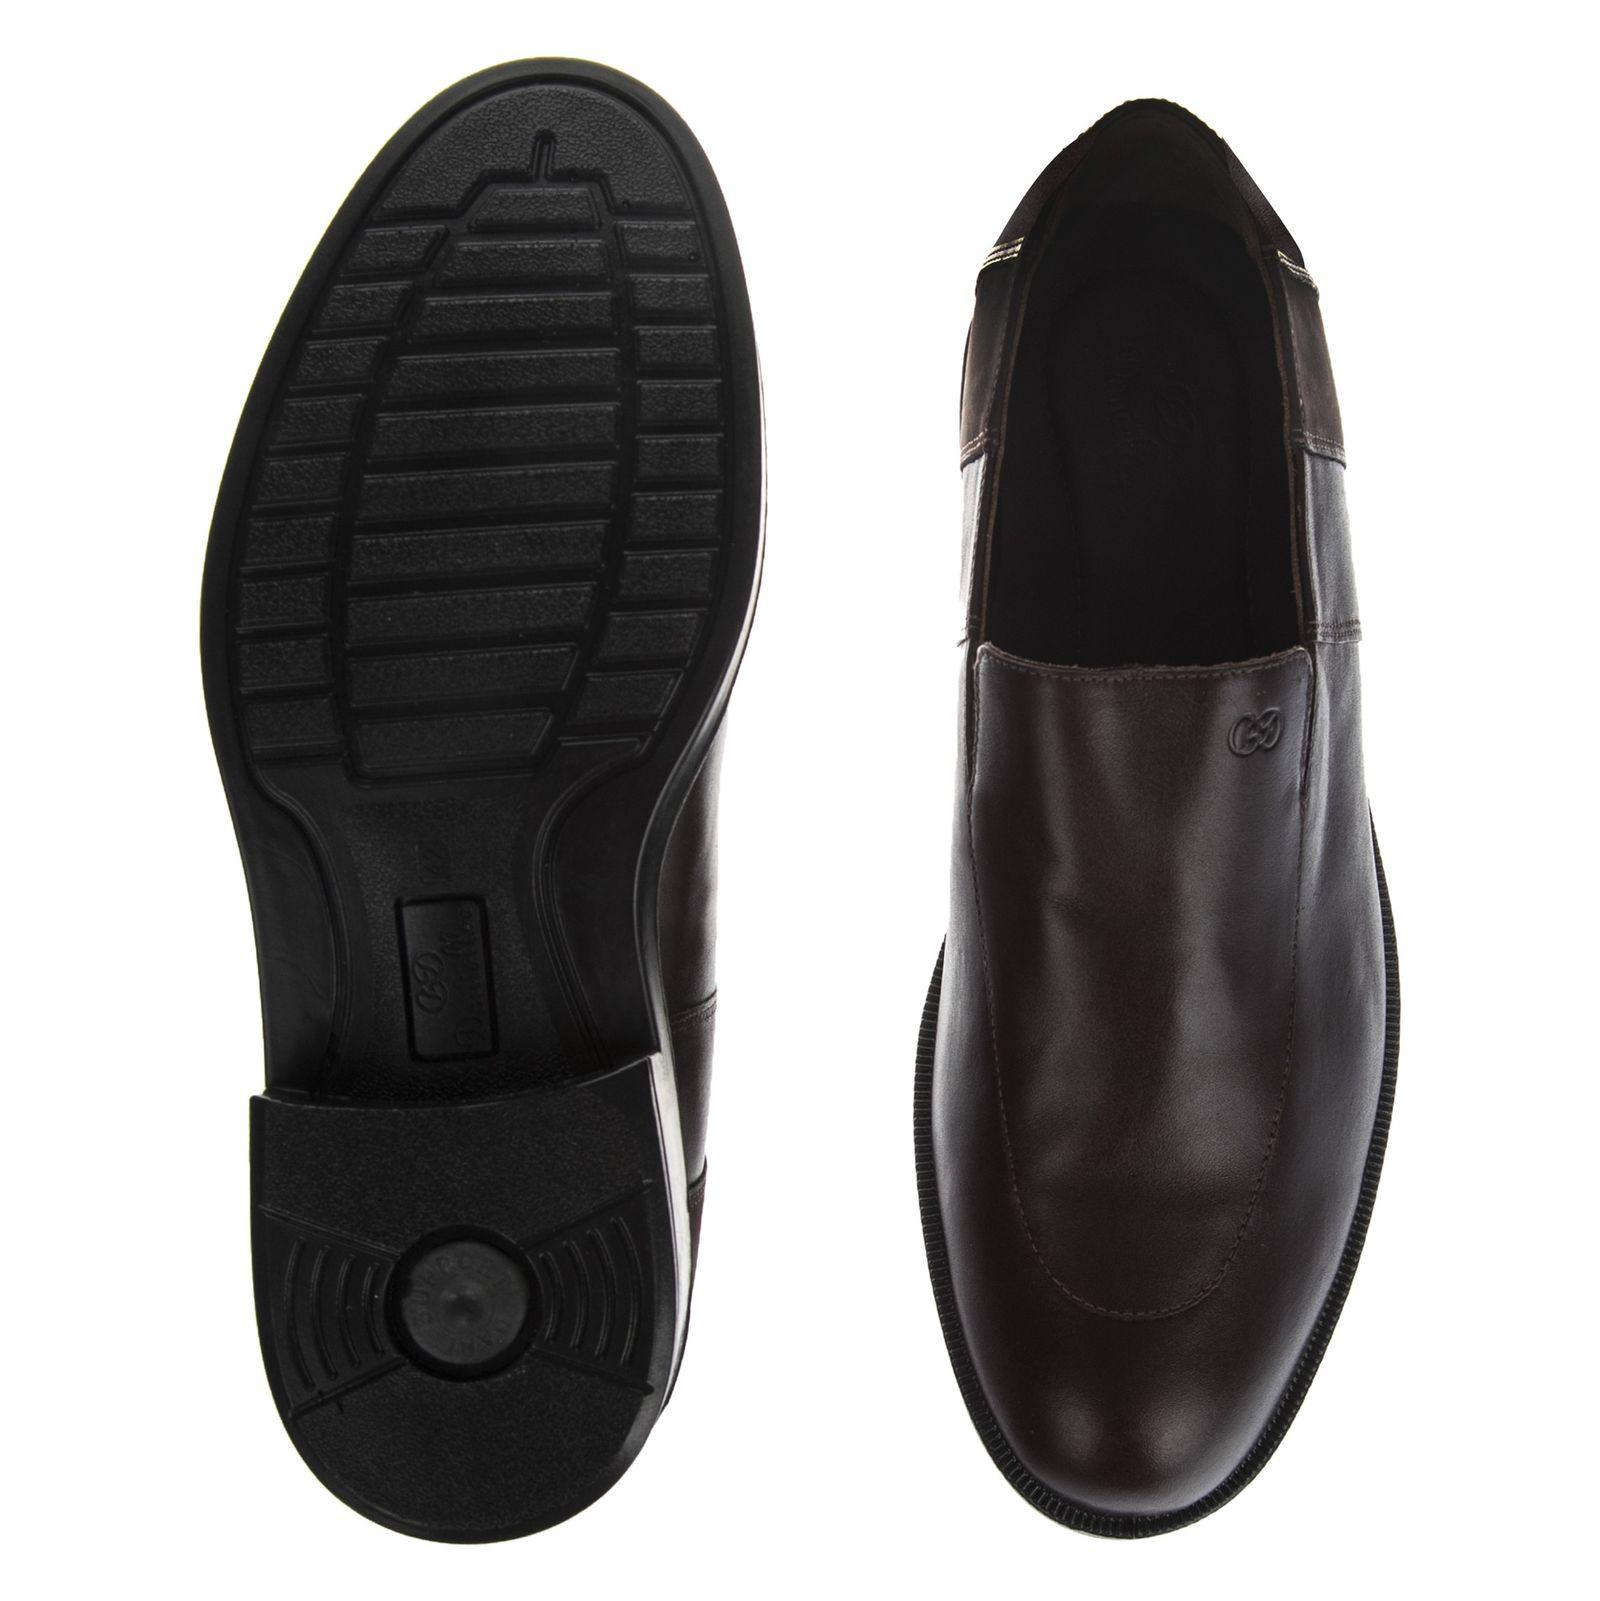 کفش مردانه دنیلی مدل 209110136019 -  - 7